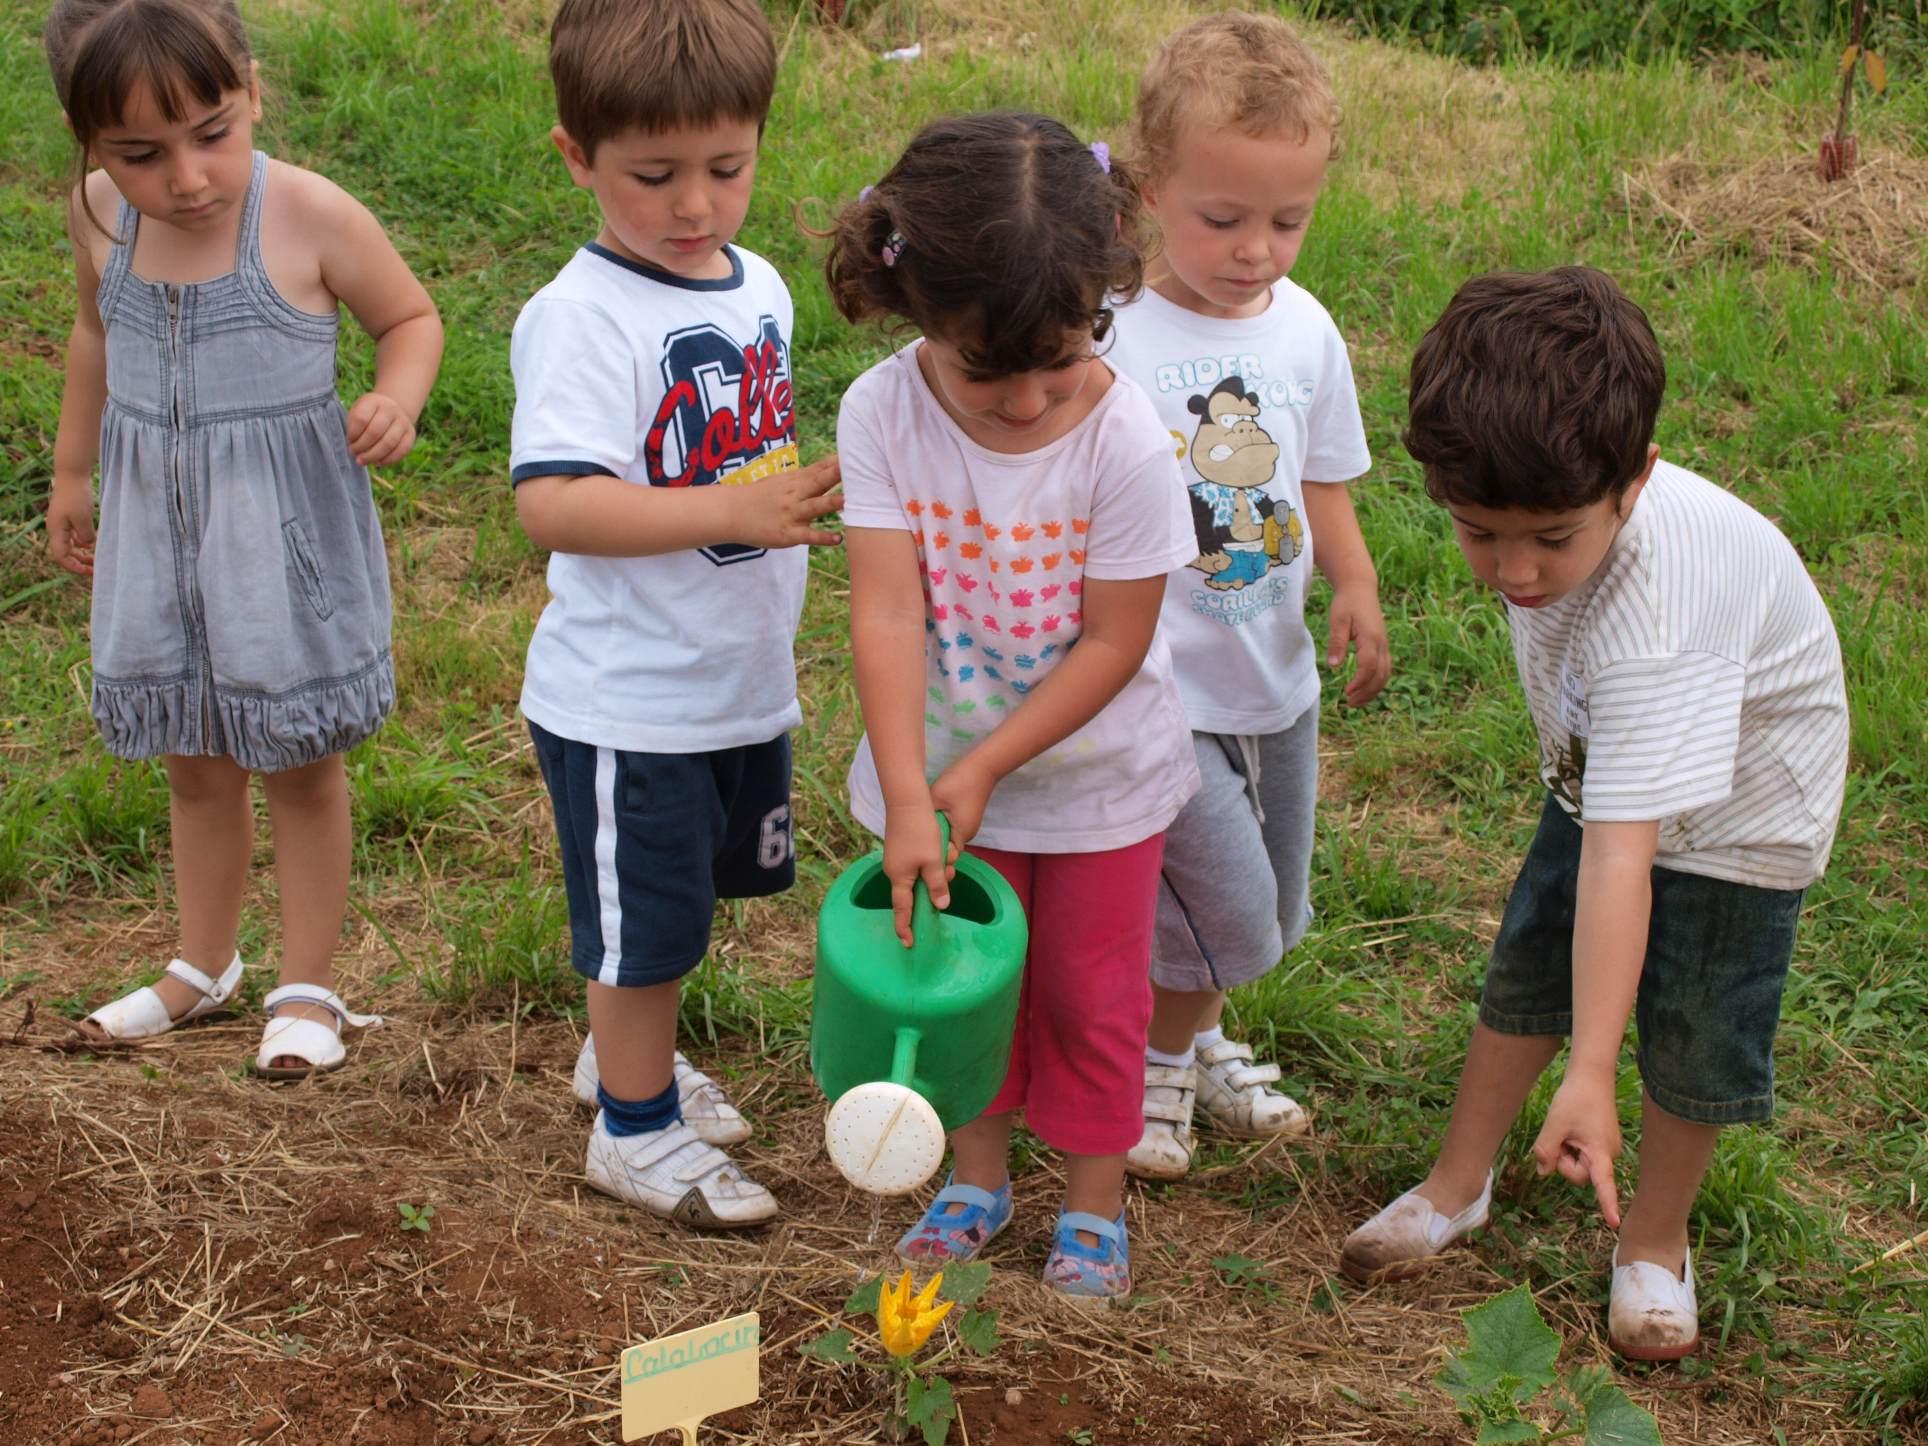 El huerto en el jard n infantil mucho m s que un huerto for Actividades para jardin infantil